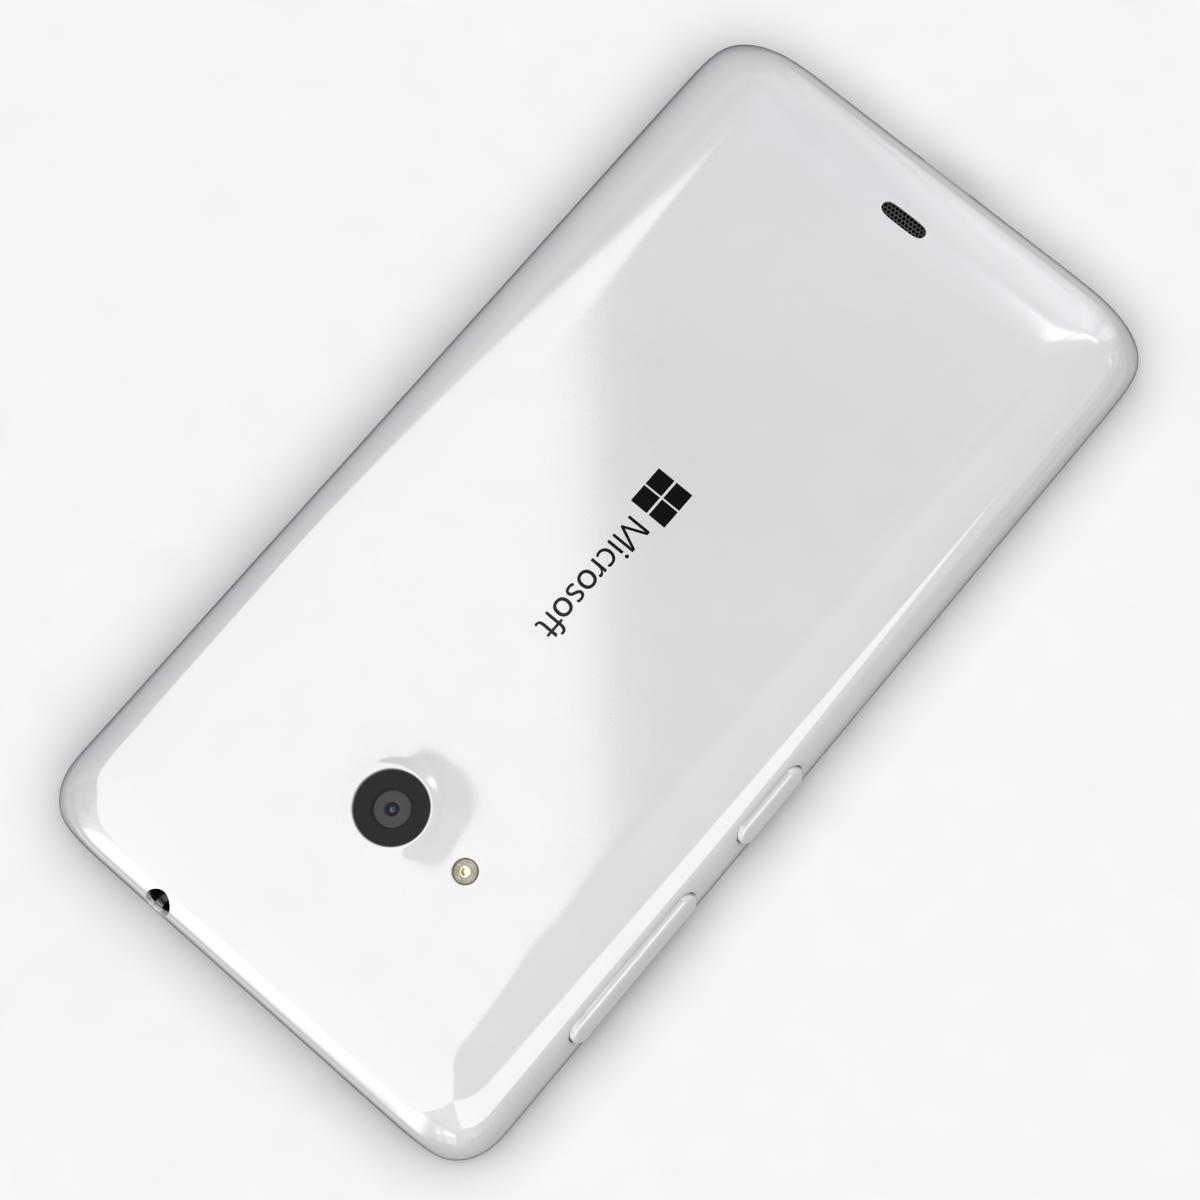 microsoft lumia 535 and dual sim white 3d model 3ds max fbx c4d obj 204286